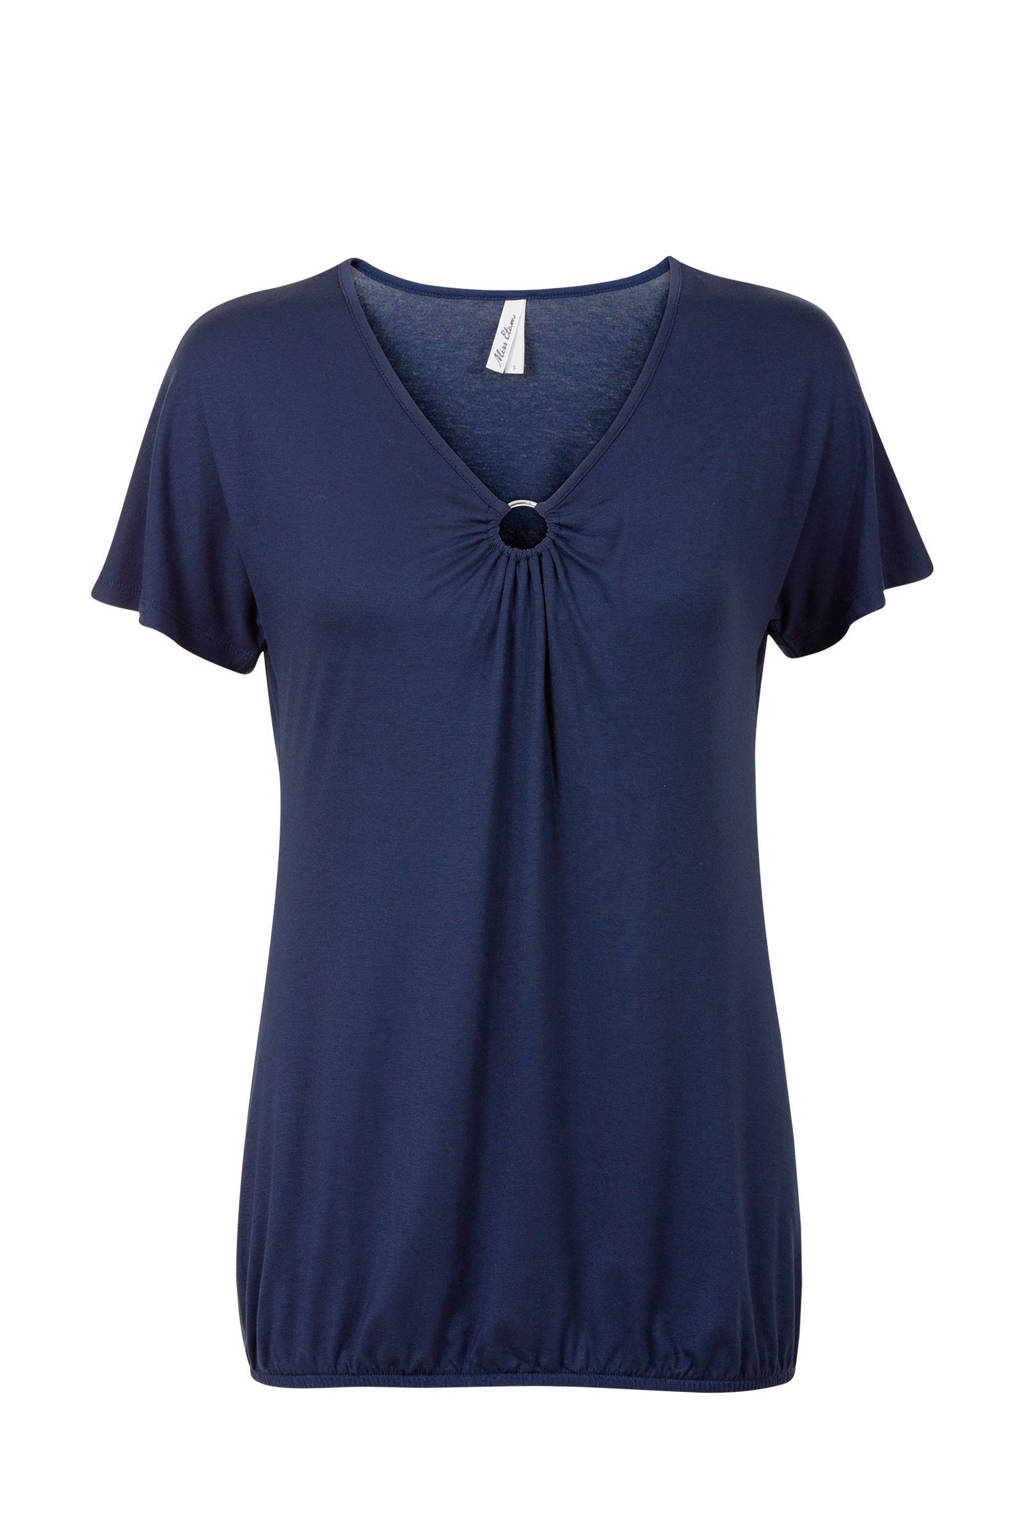 Miss Etam Regulier top met ringdetail donkerblauw, Donkerblauw